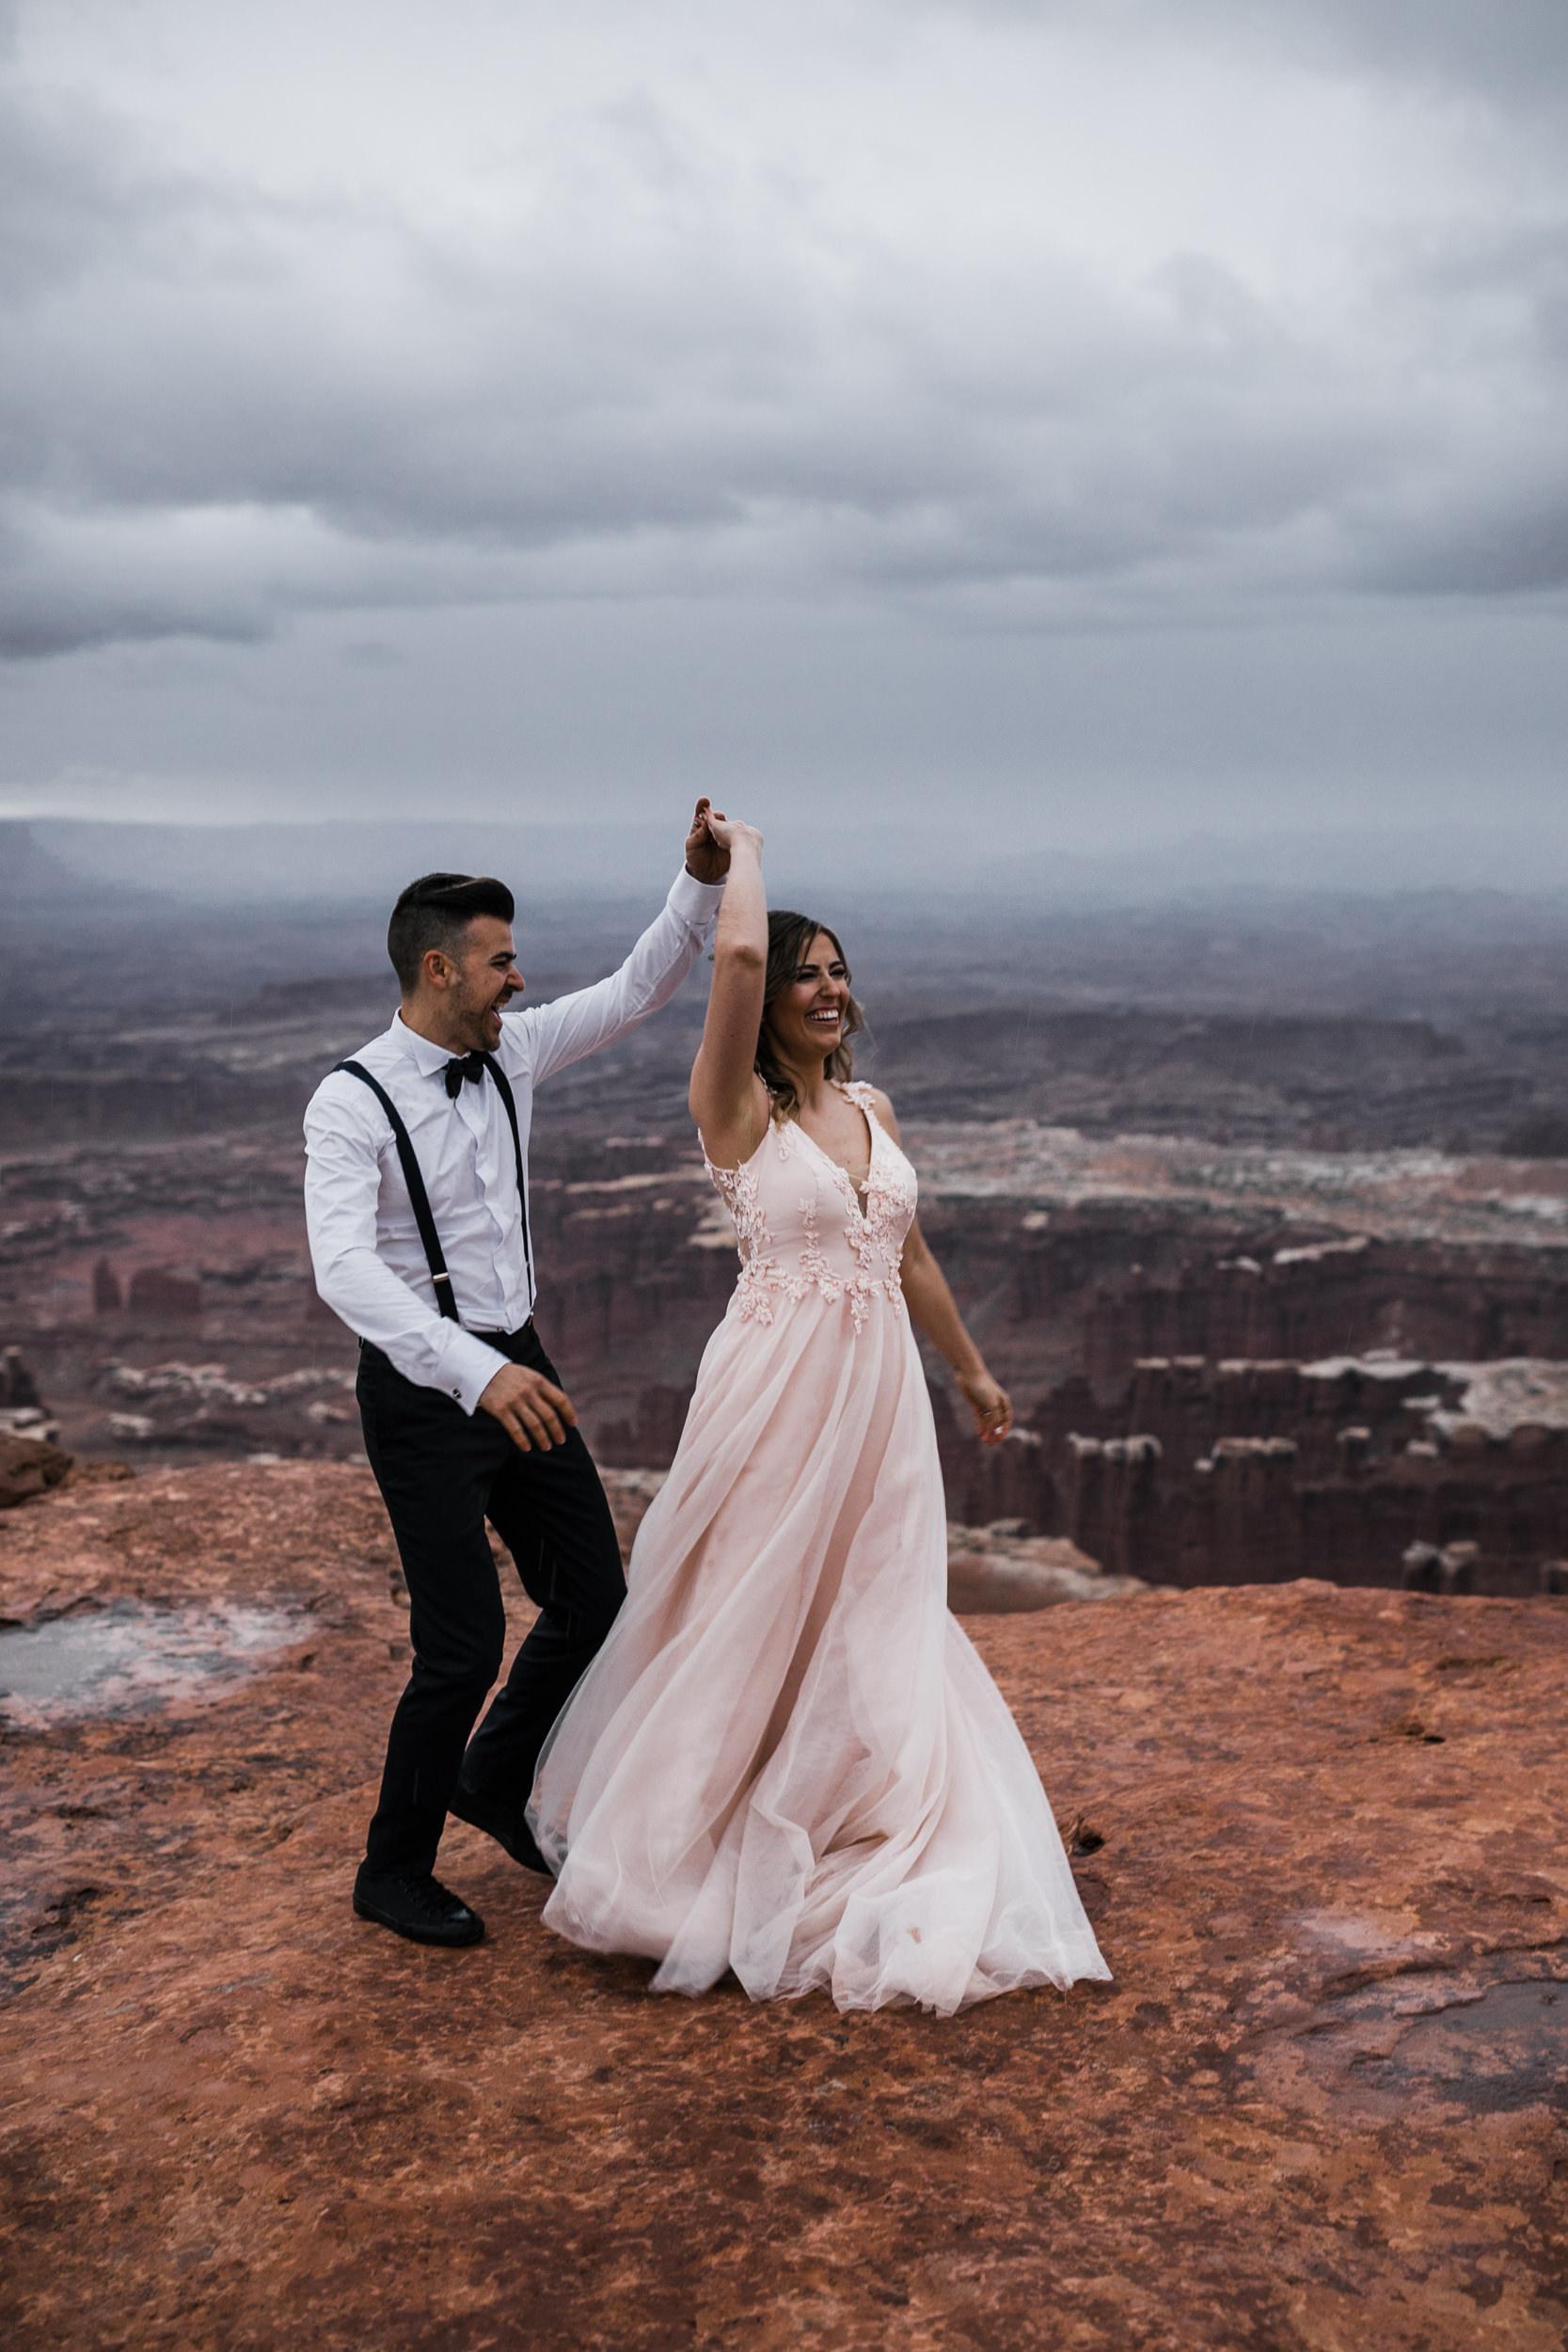 Hearnes-Elopement-Photography-Canyonlands-National-Park-Moab-Wedding-33.jpg